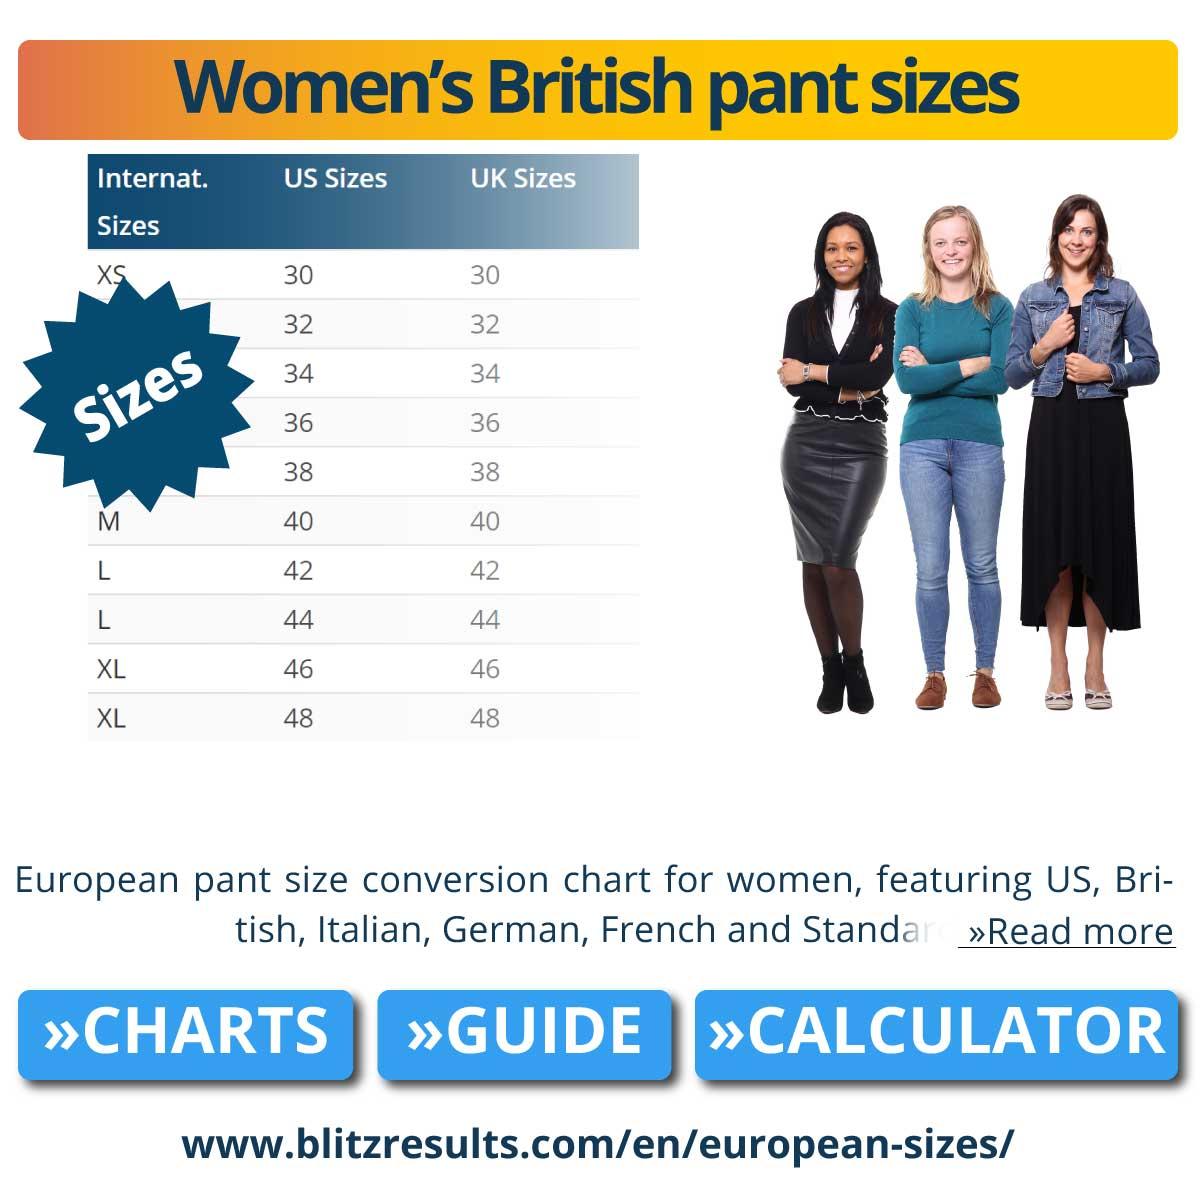 Women's British pant sizes